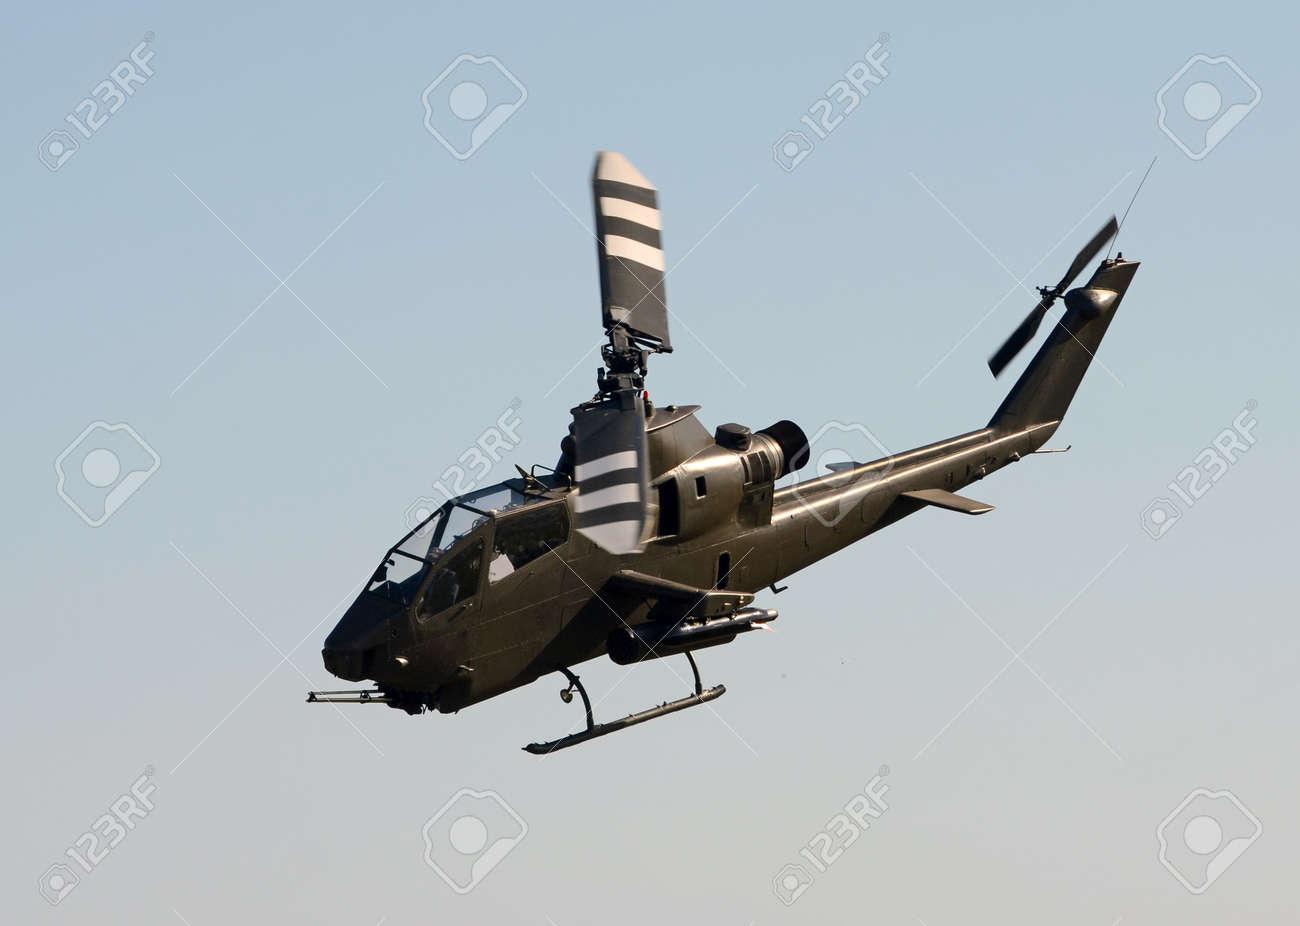 Vietnam War era helicopter in flight